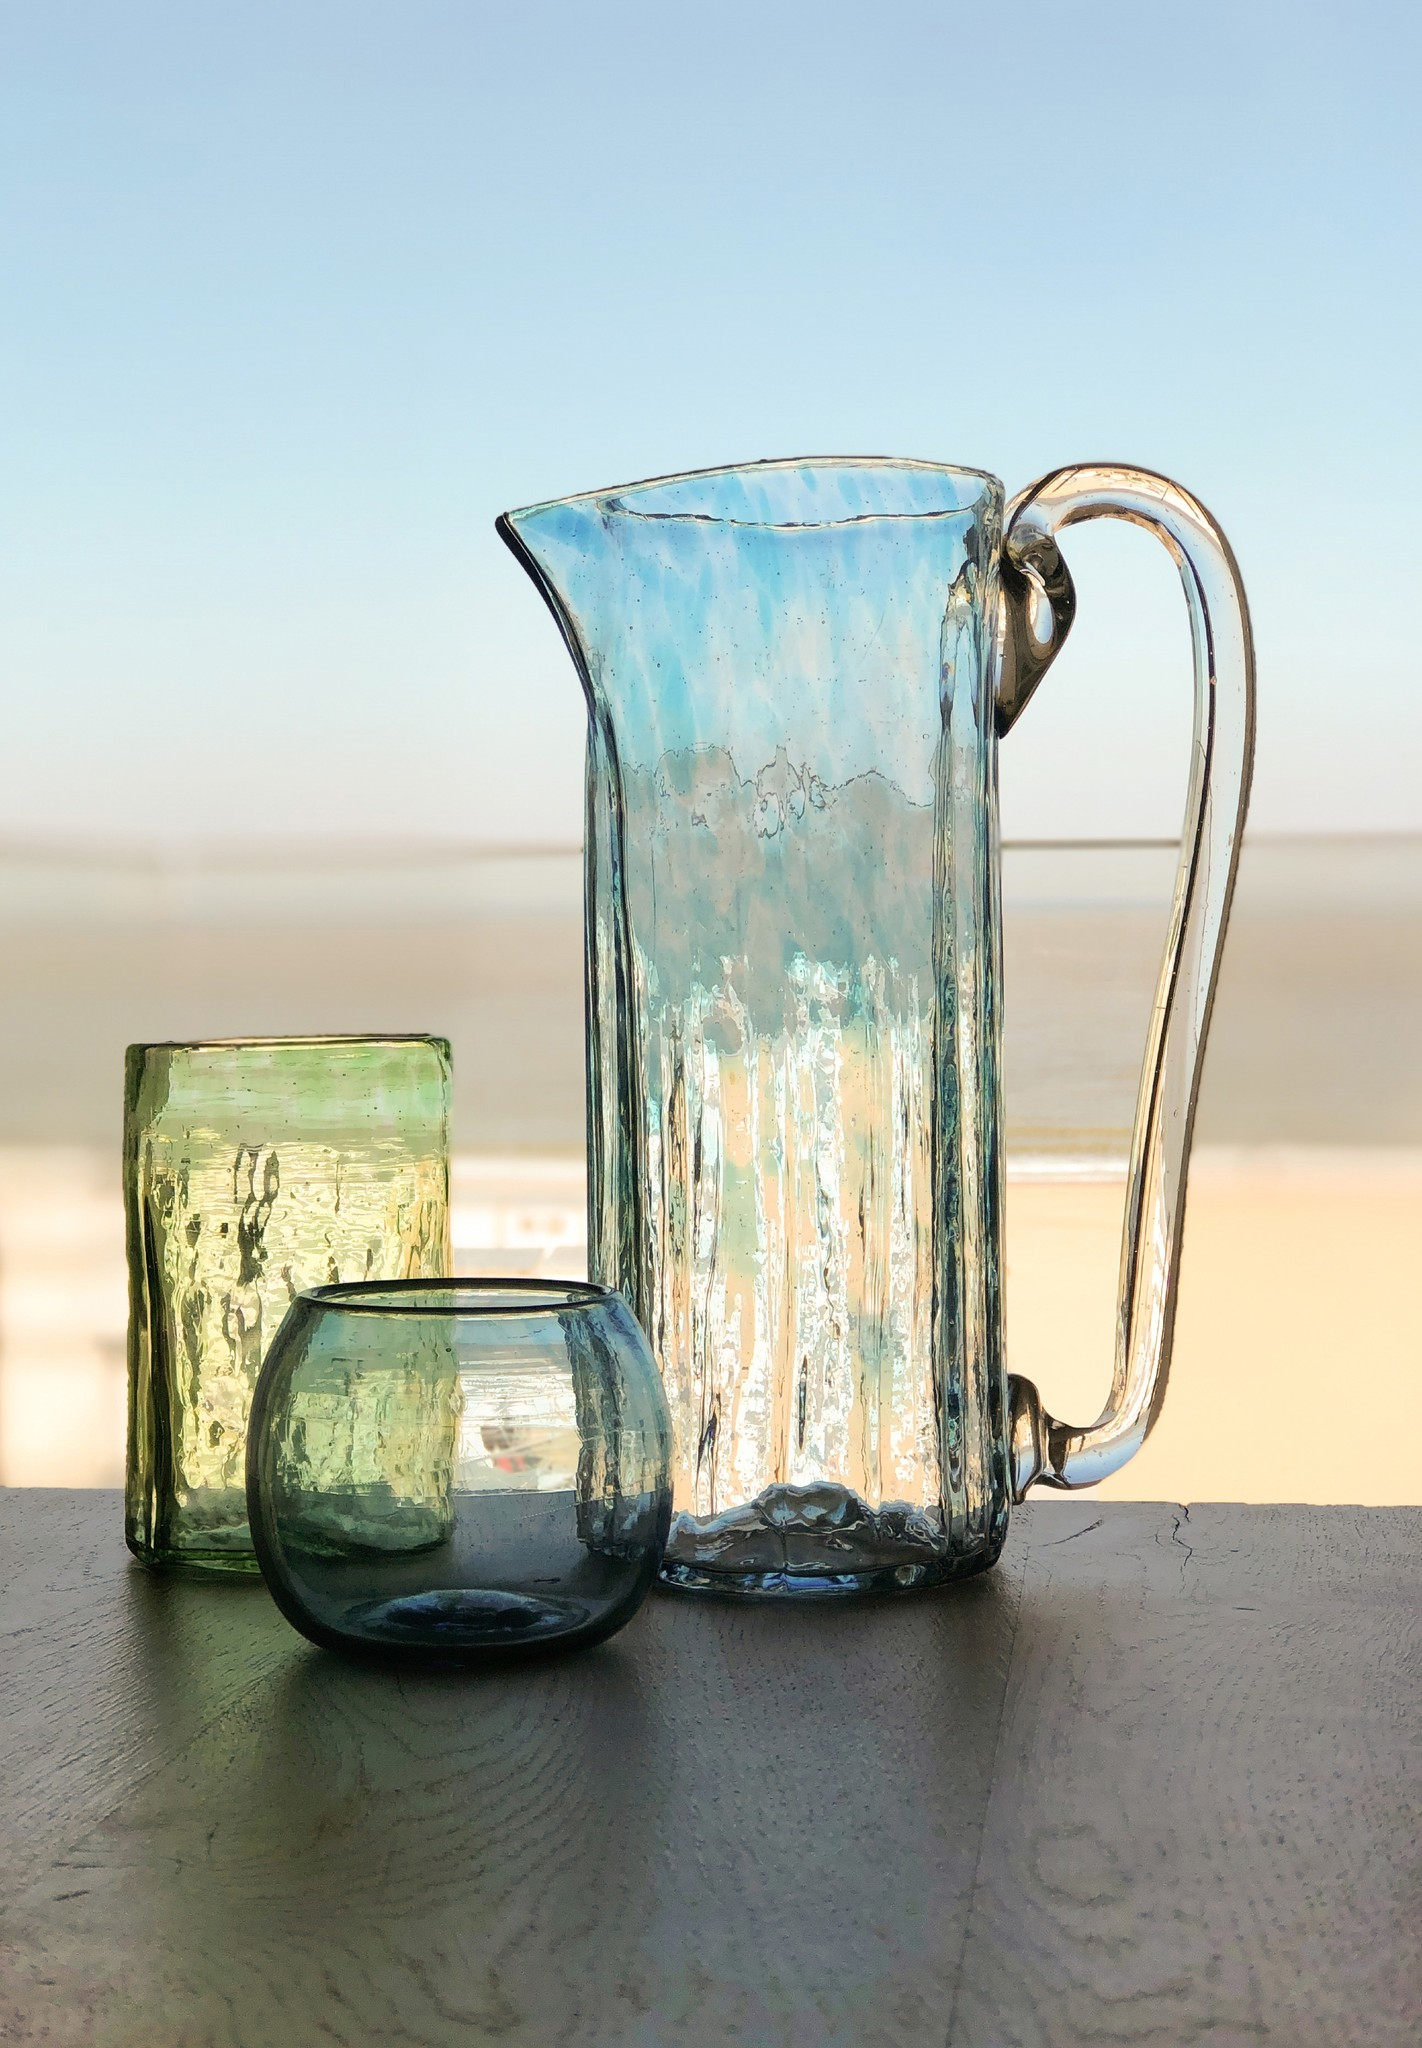 Handgeblazen glazen schenkkan